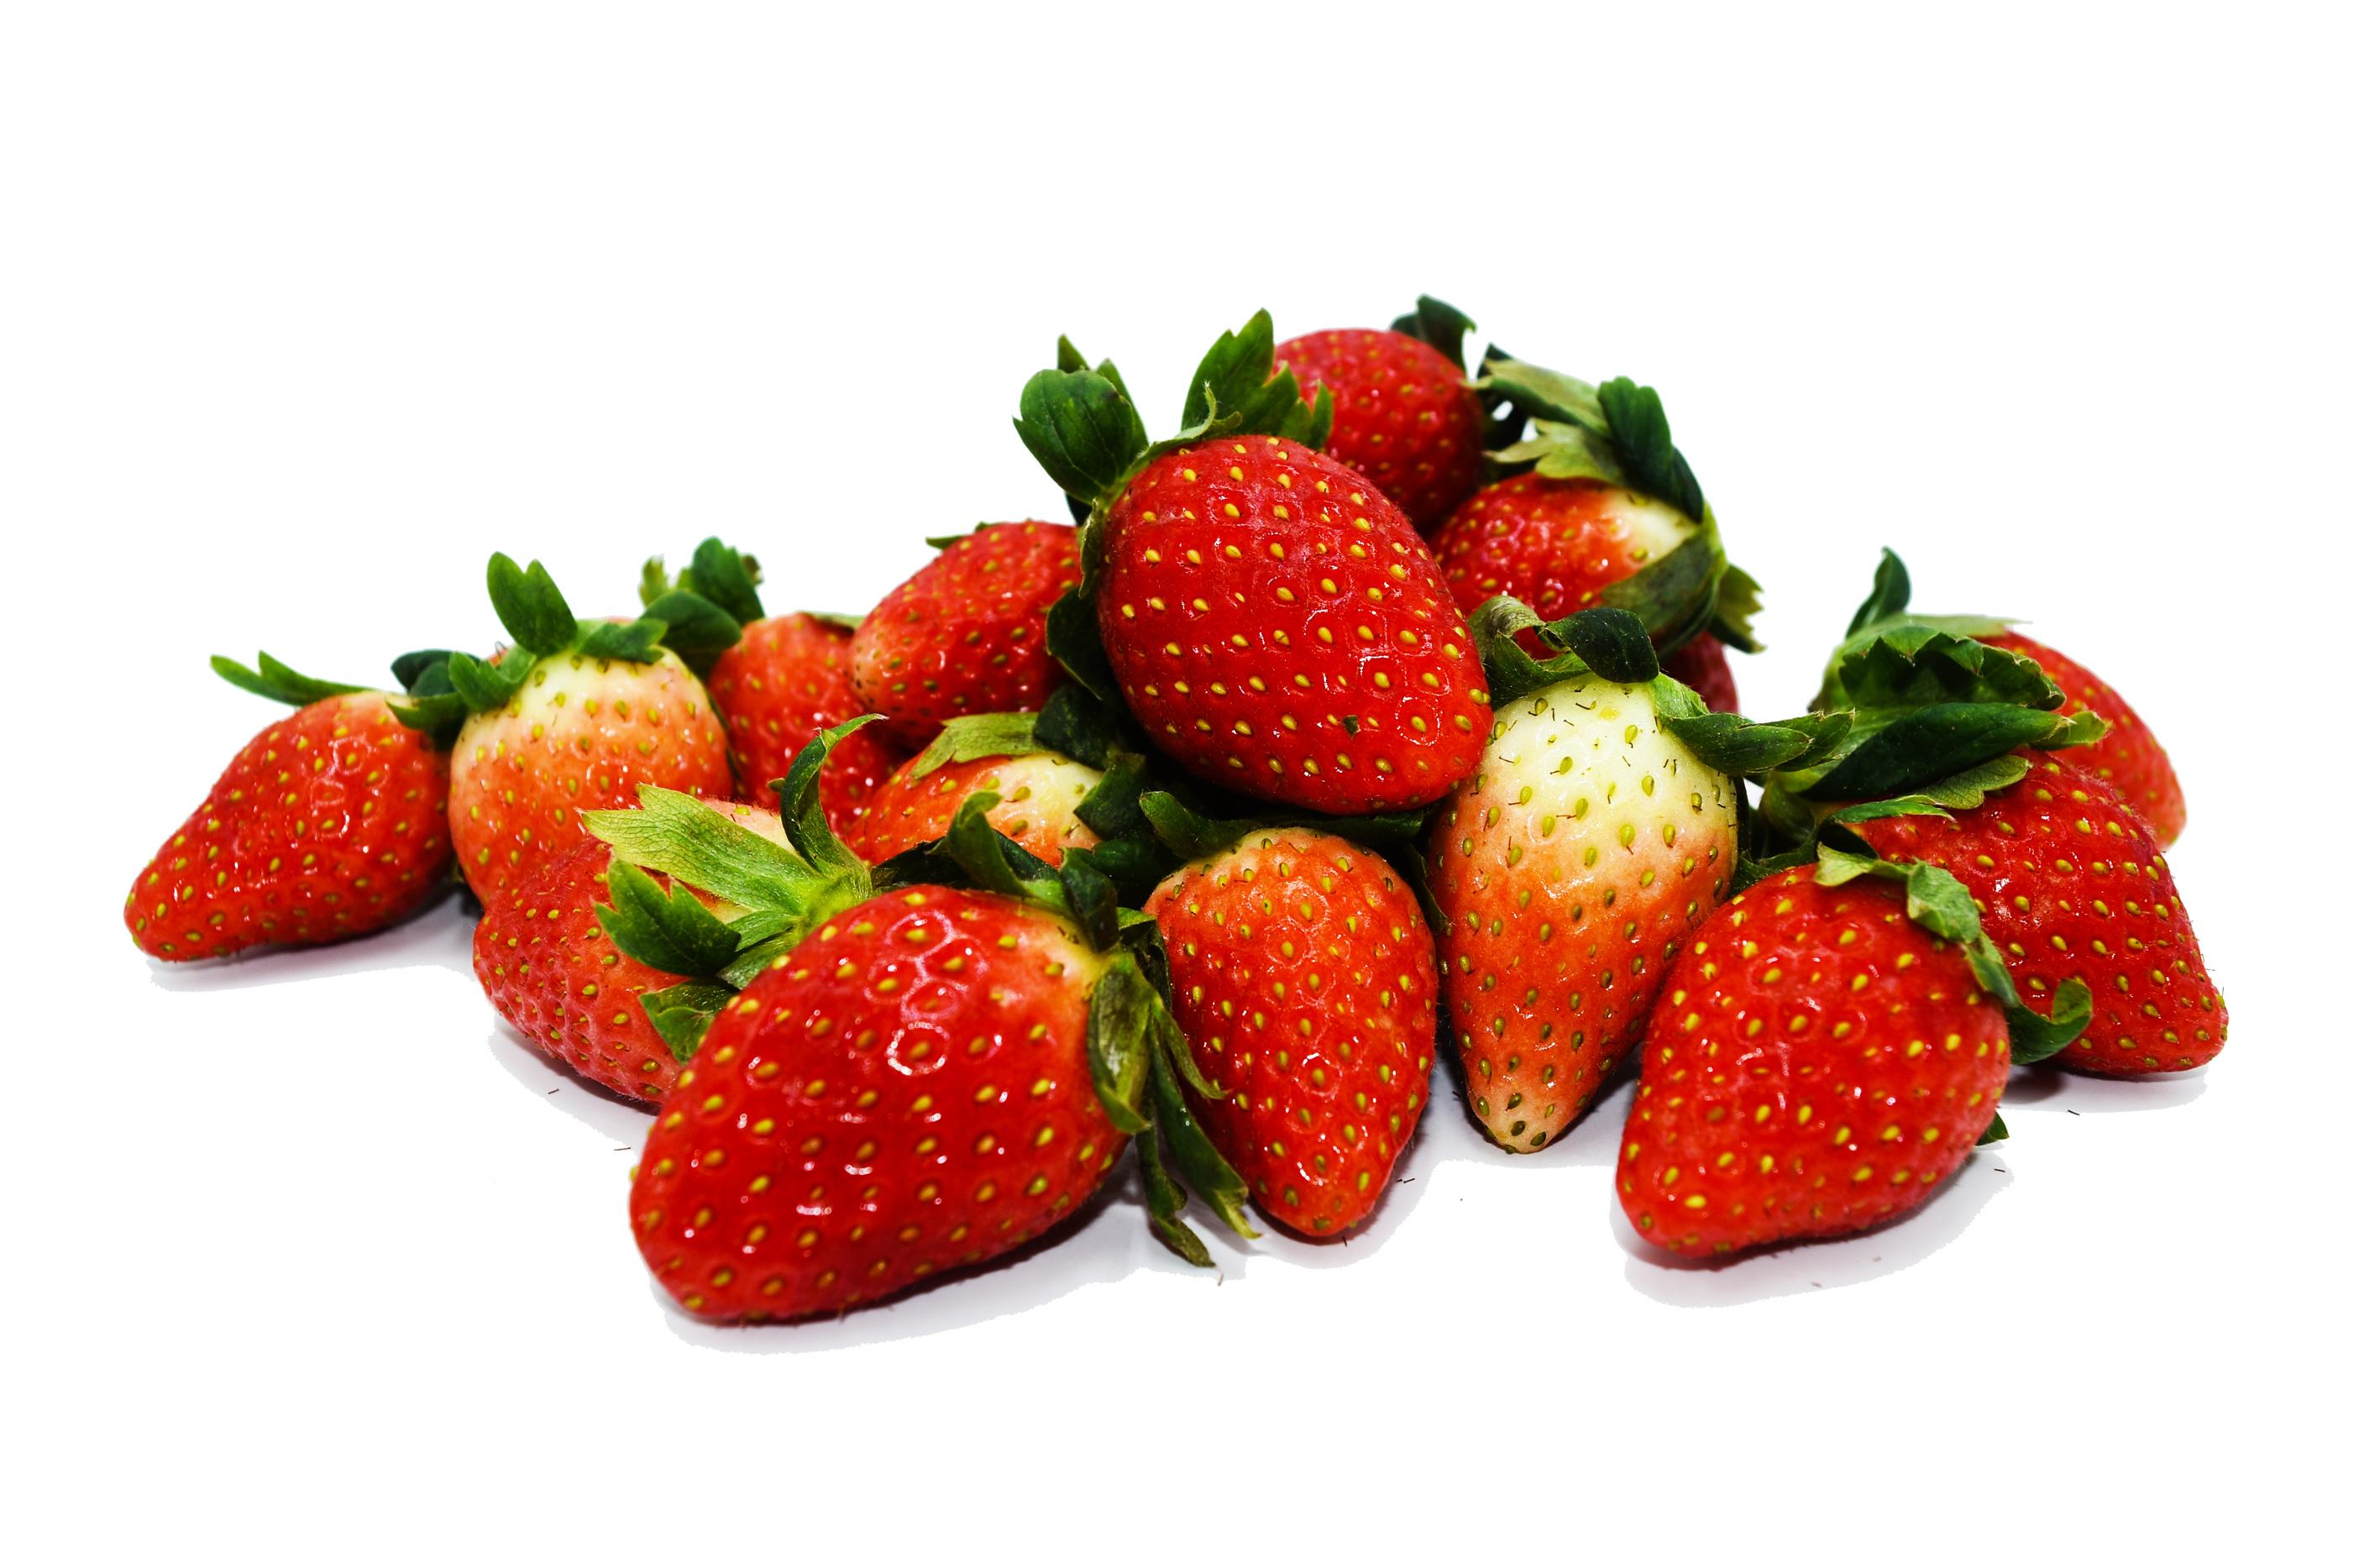 strawberrykorea